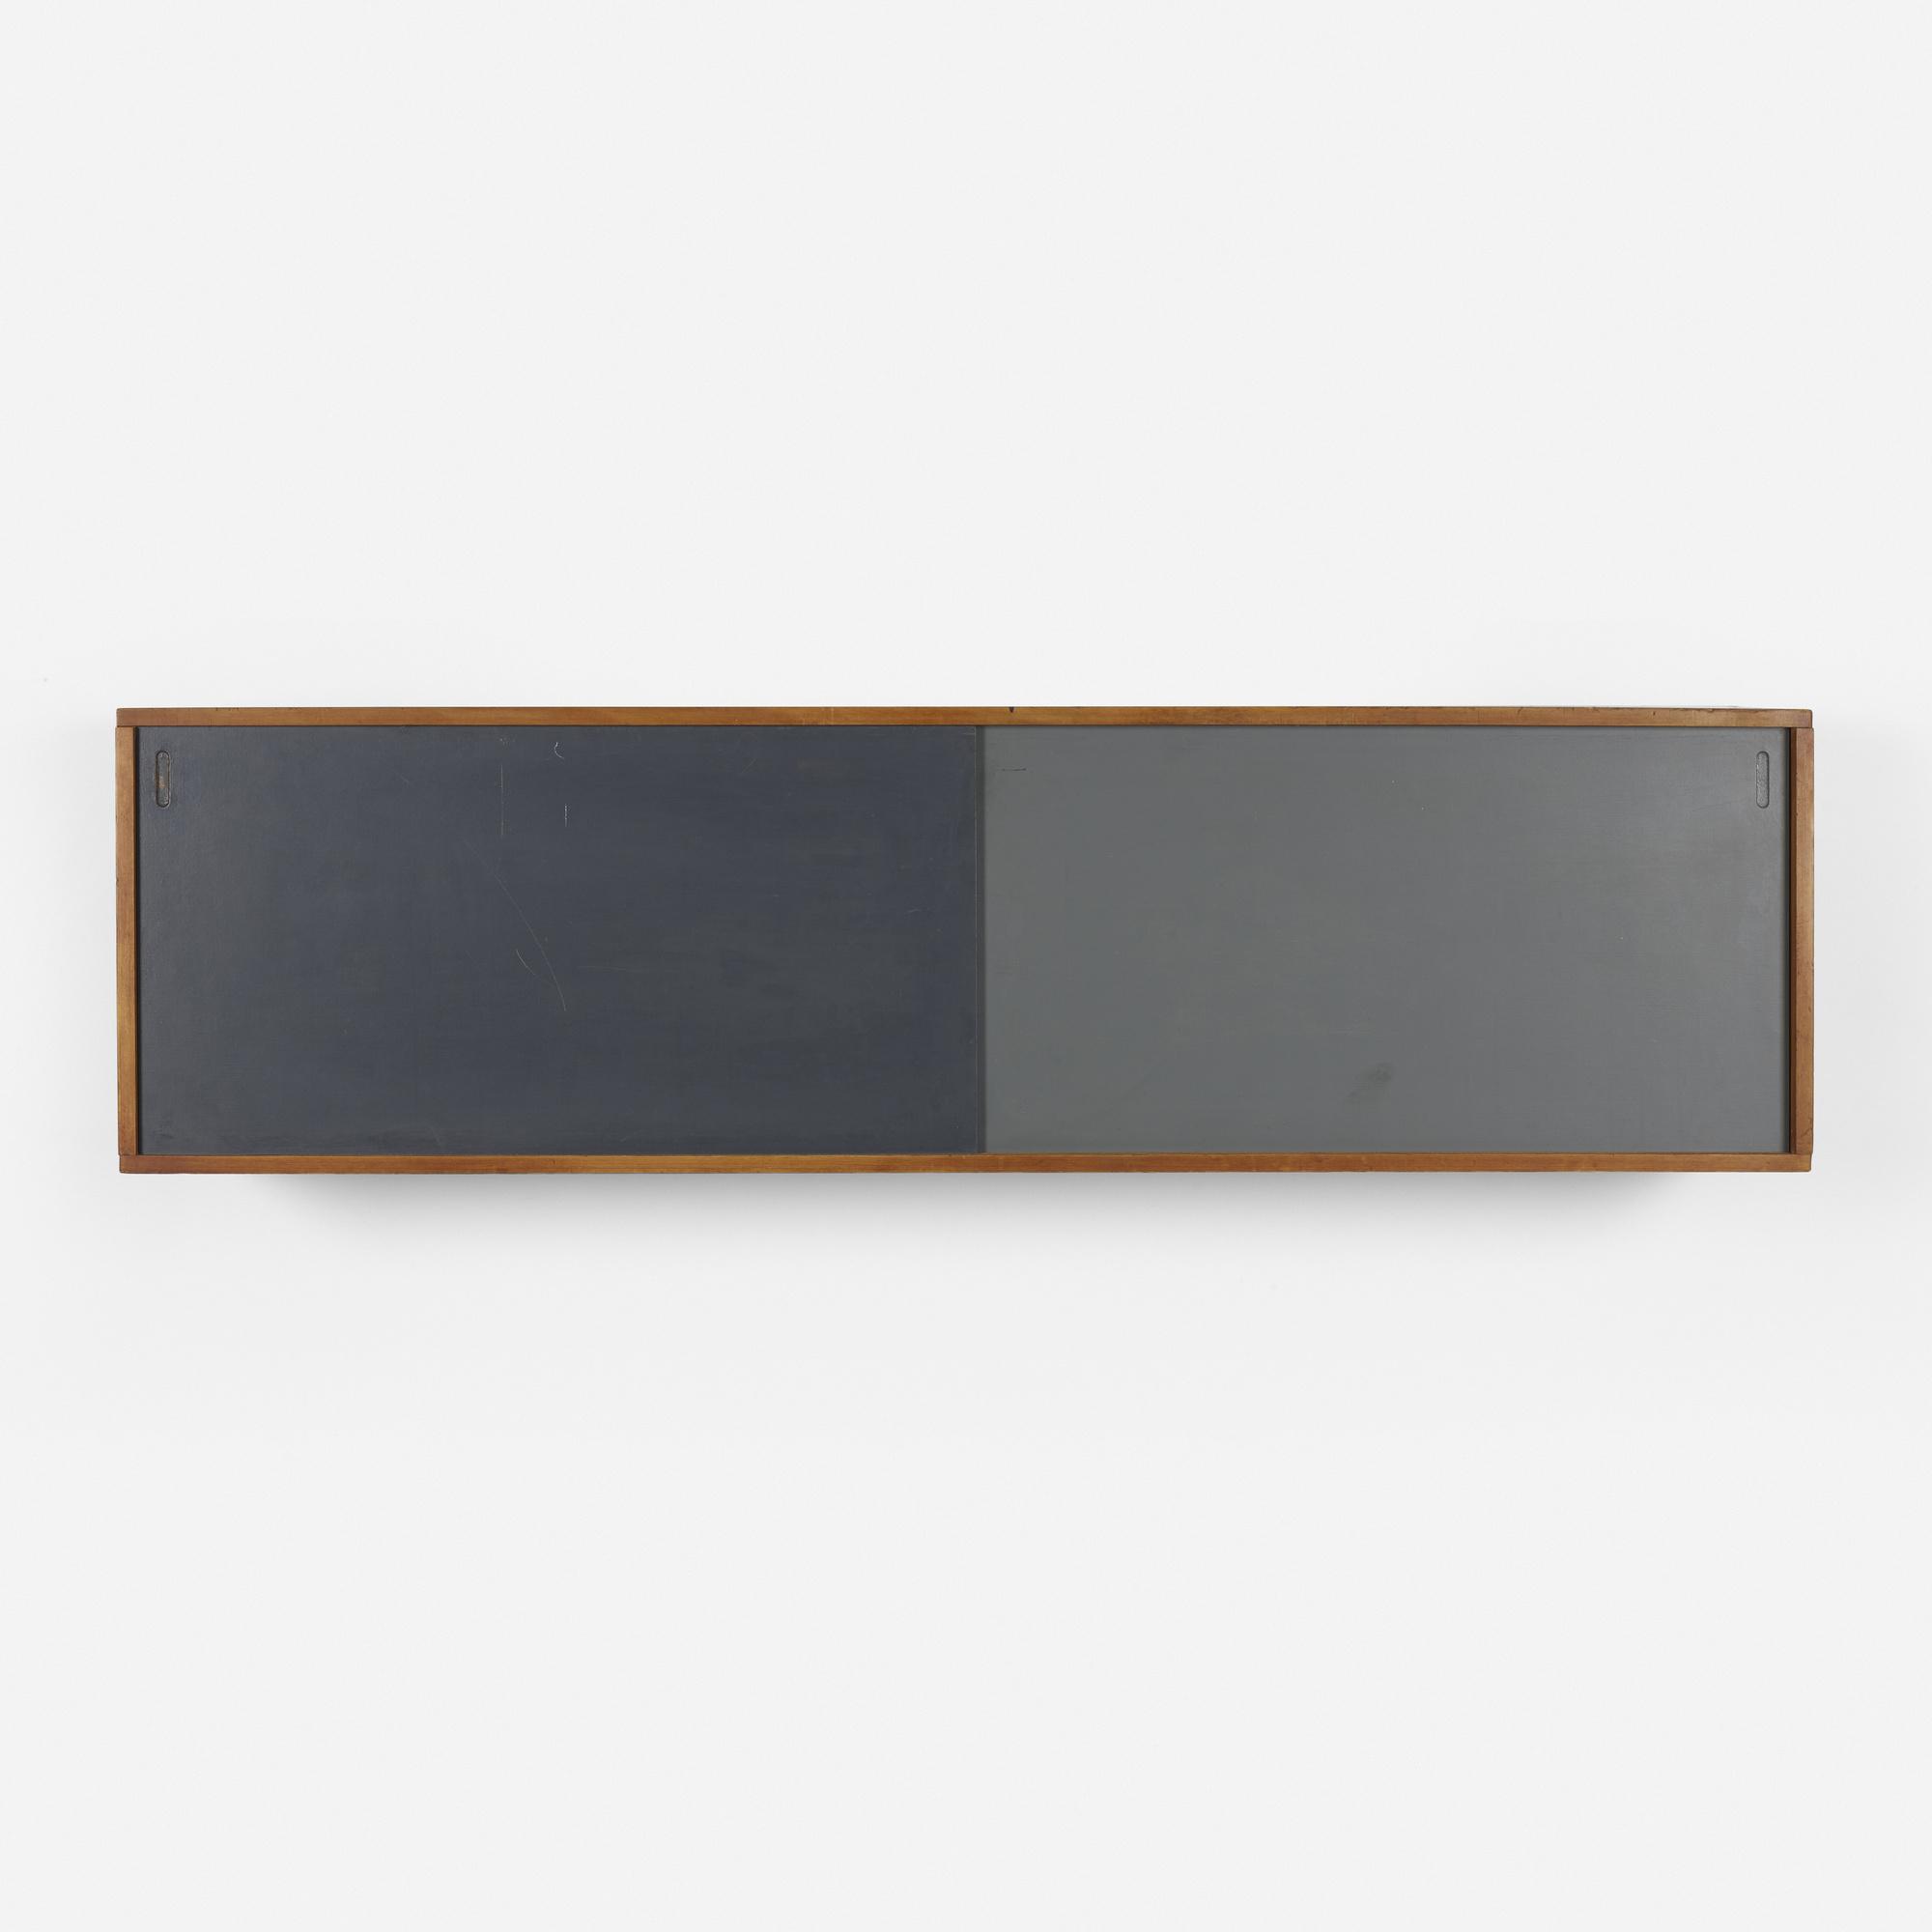 Meget 192: HENRIK IVERSEN AND HARALD PLUM, wall-mounted cabinet BN77